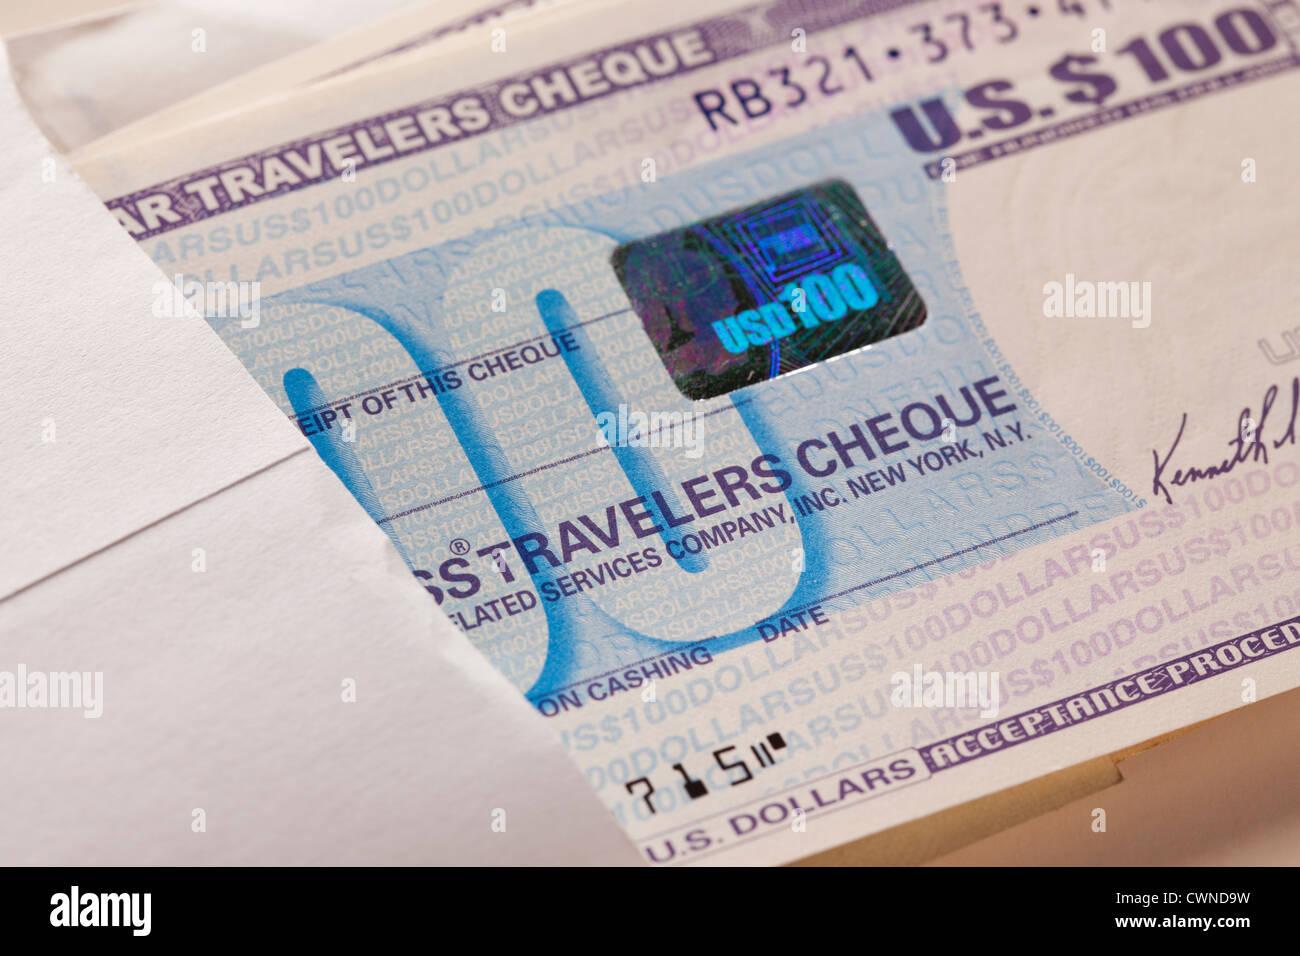 Travelers cheque - Stock Image